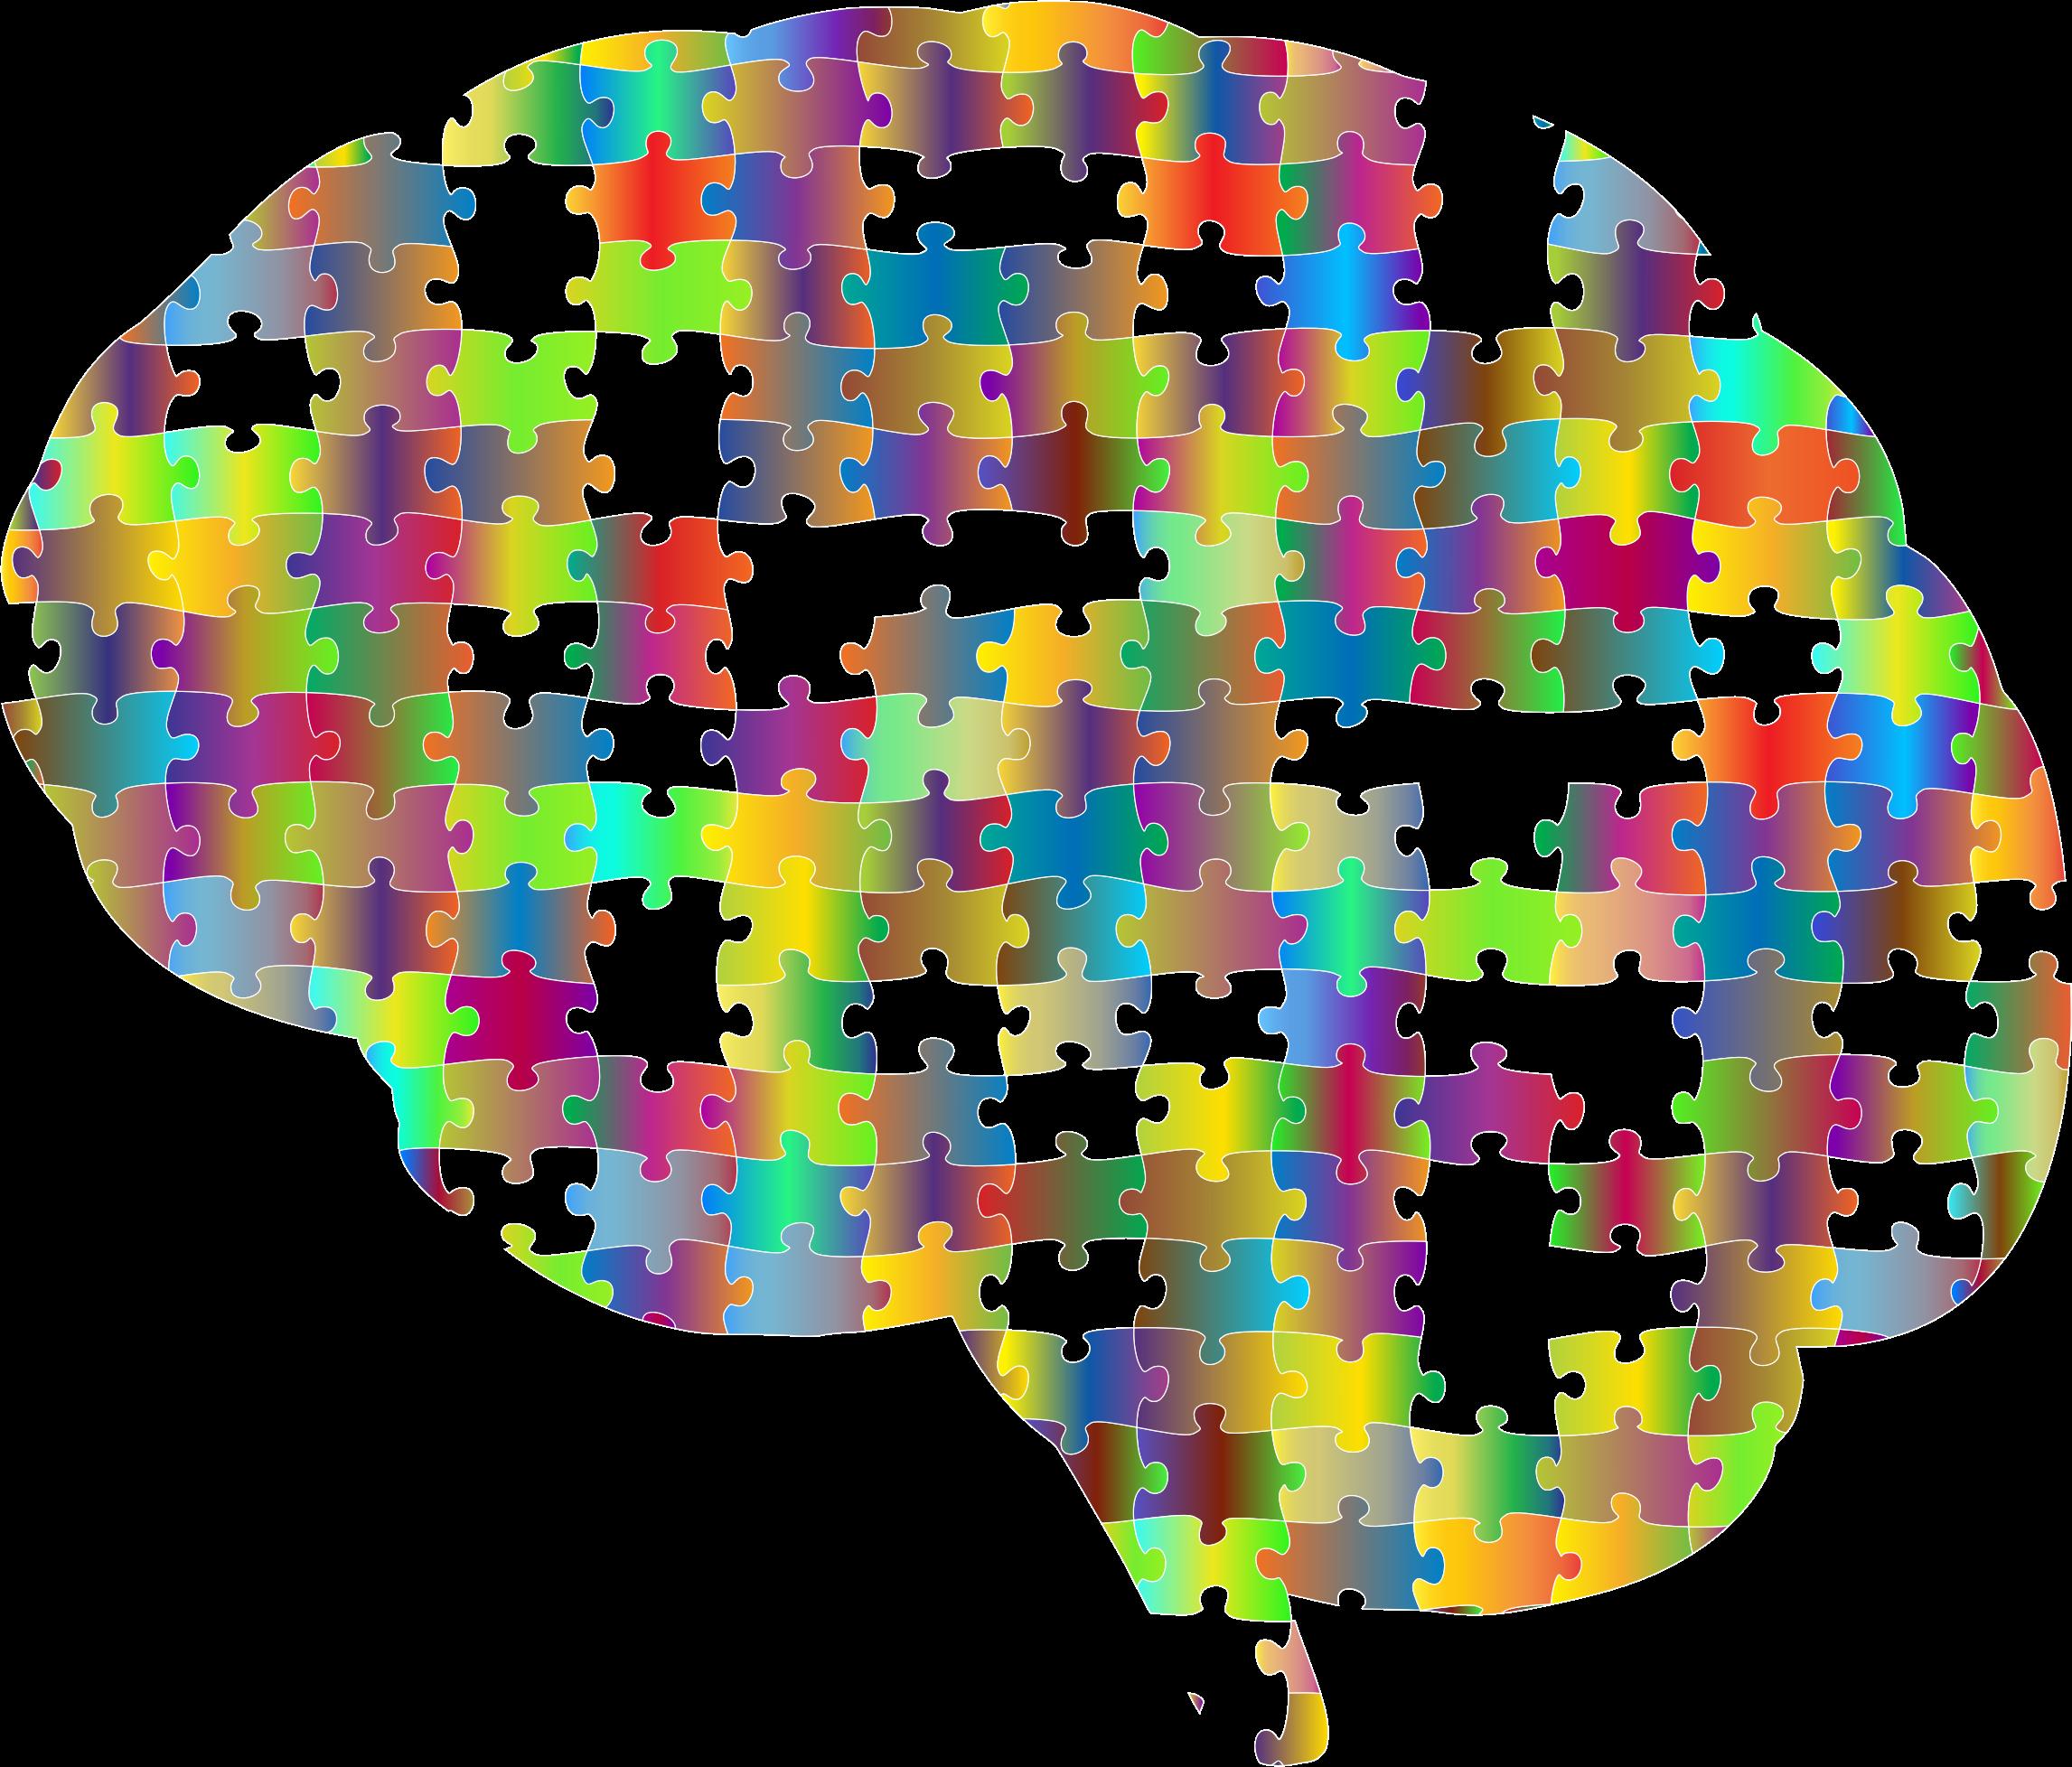 Missing brain jigsaw prismatic. Psychology clipart puzzle head